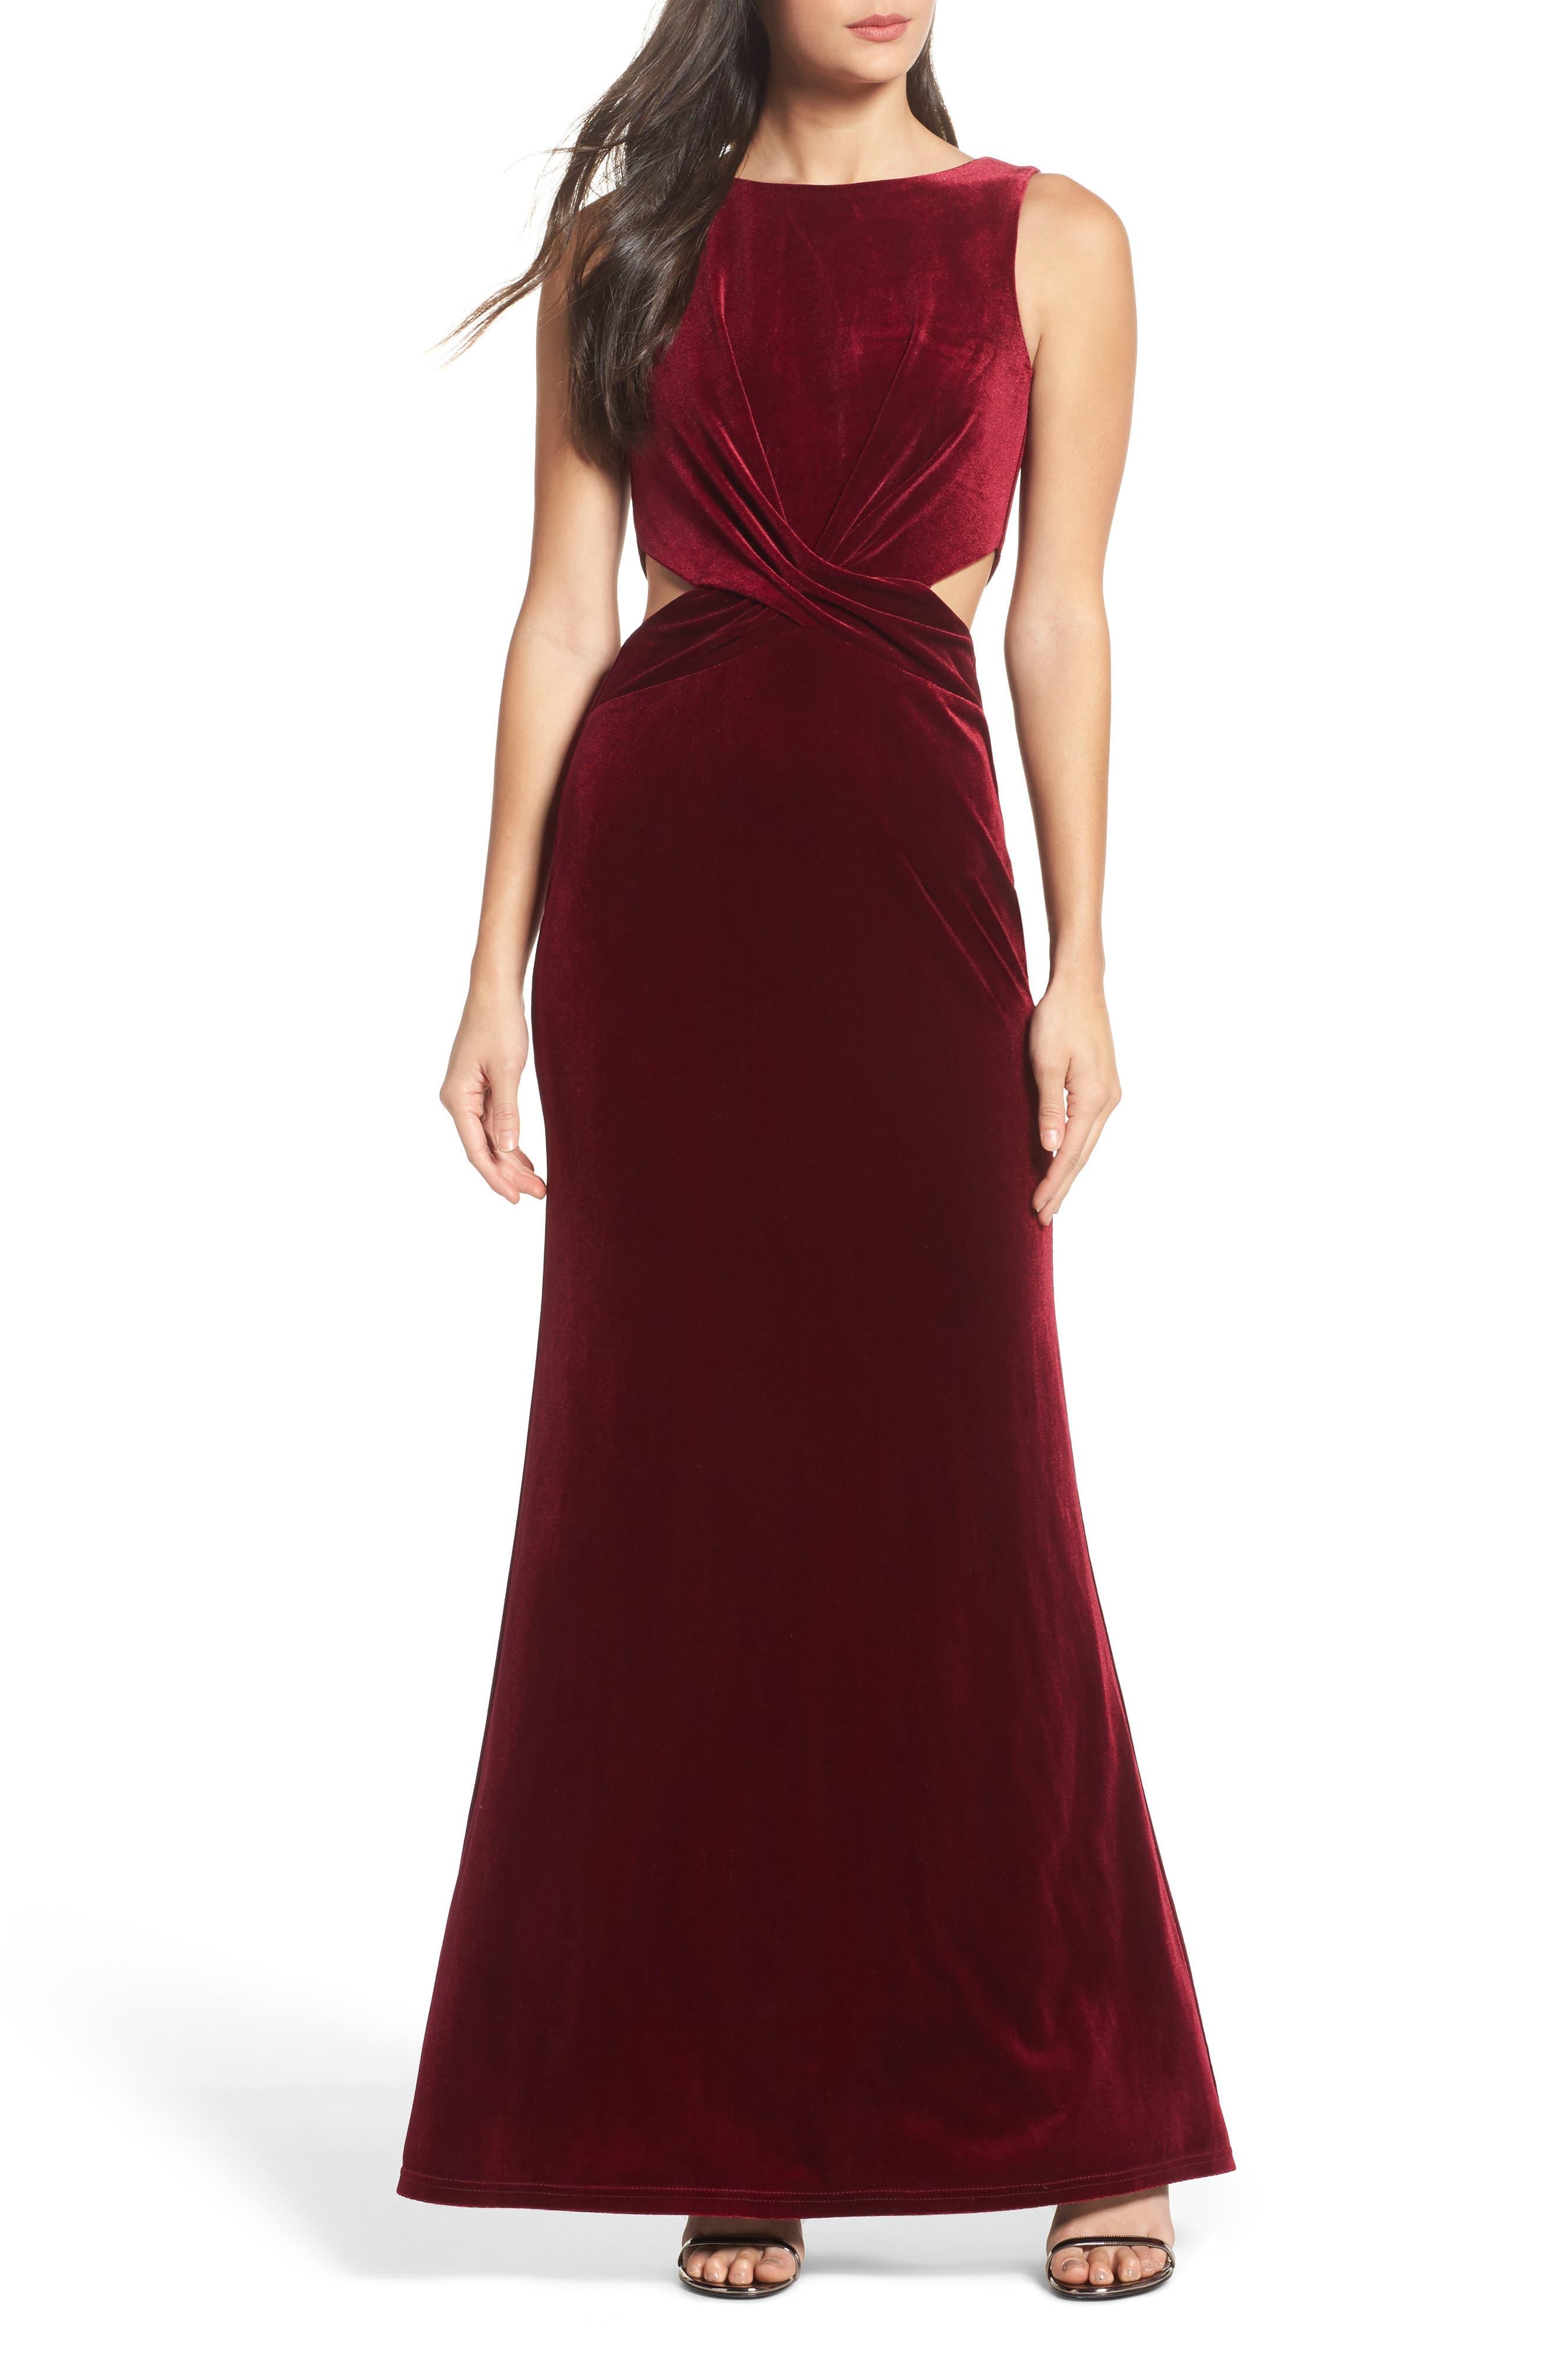 Reach Out Velvet Maxi Dress,                             Main thumbnail 1, color,                             Burgundy